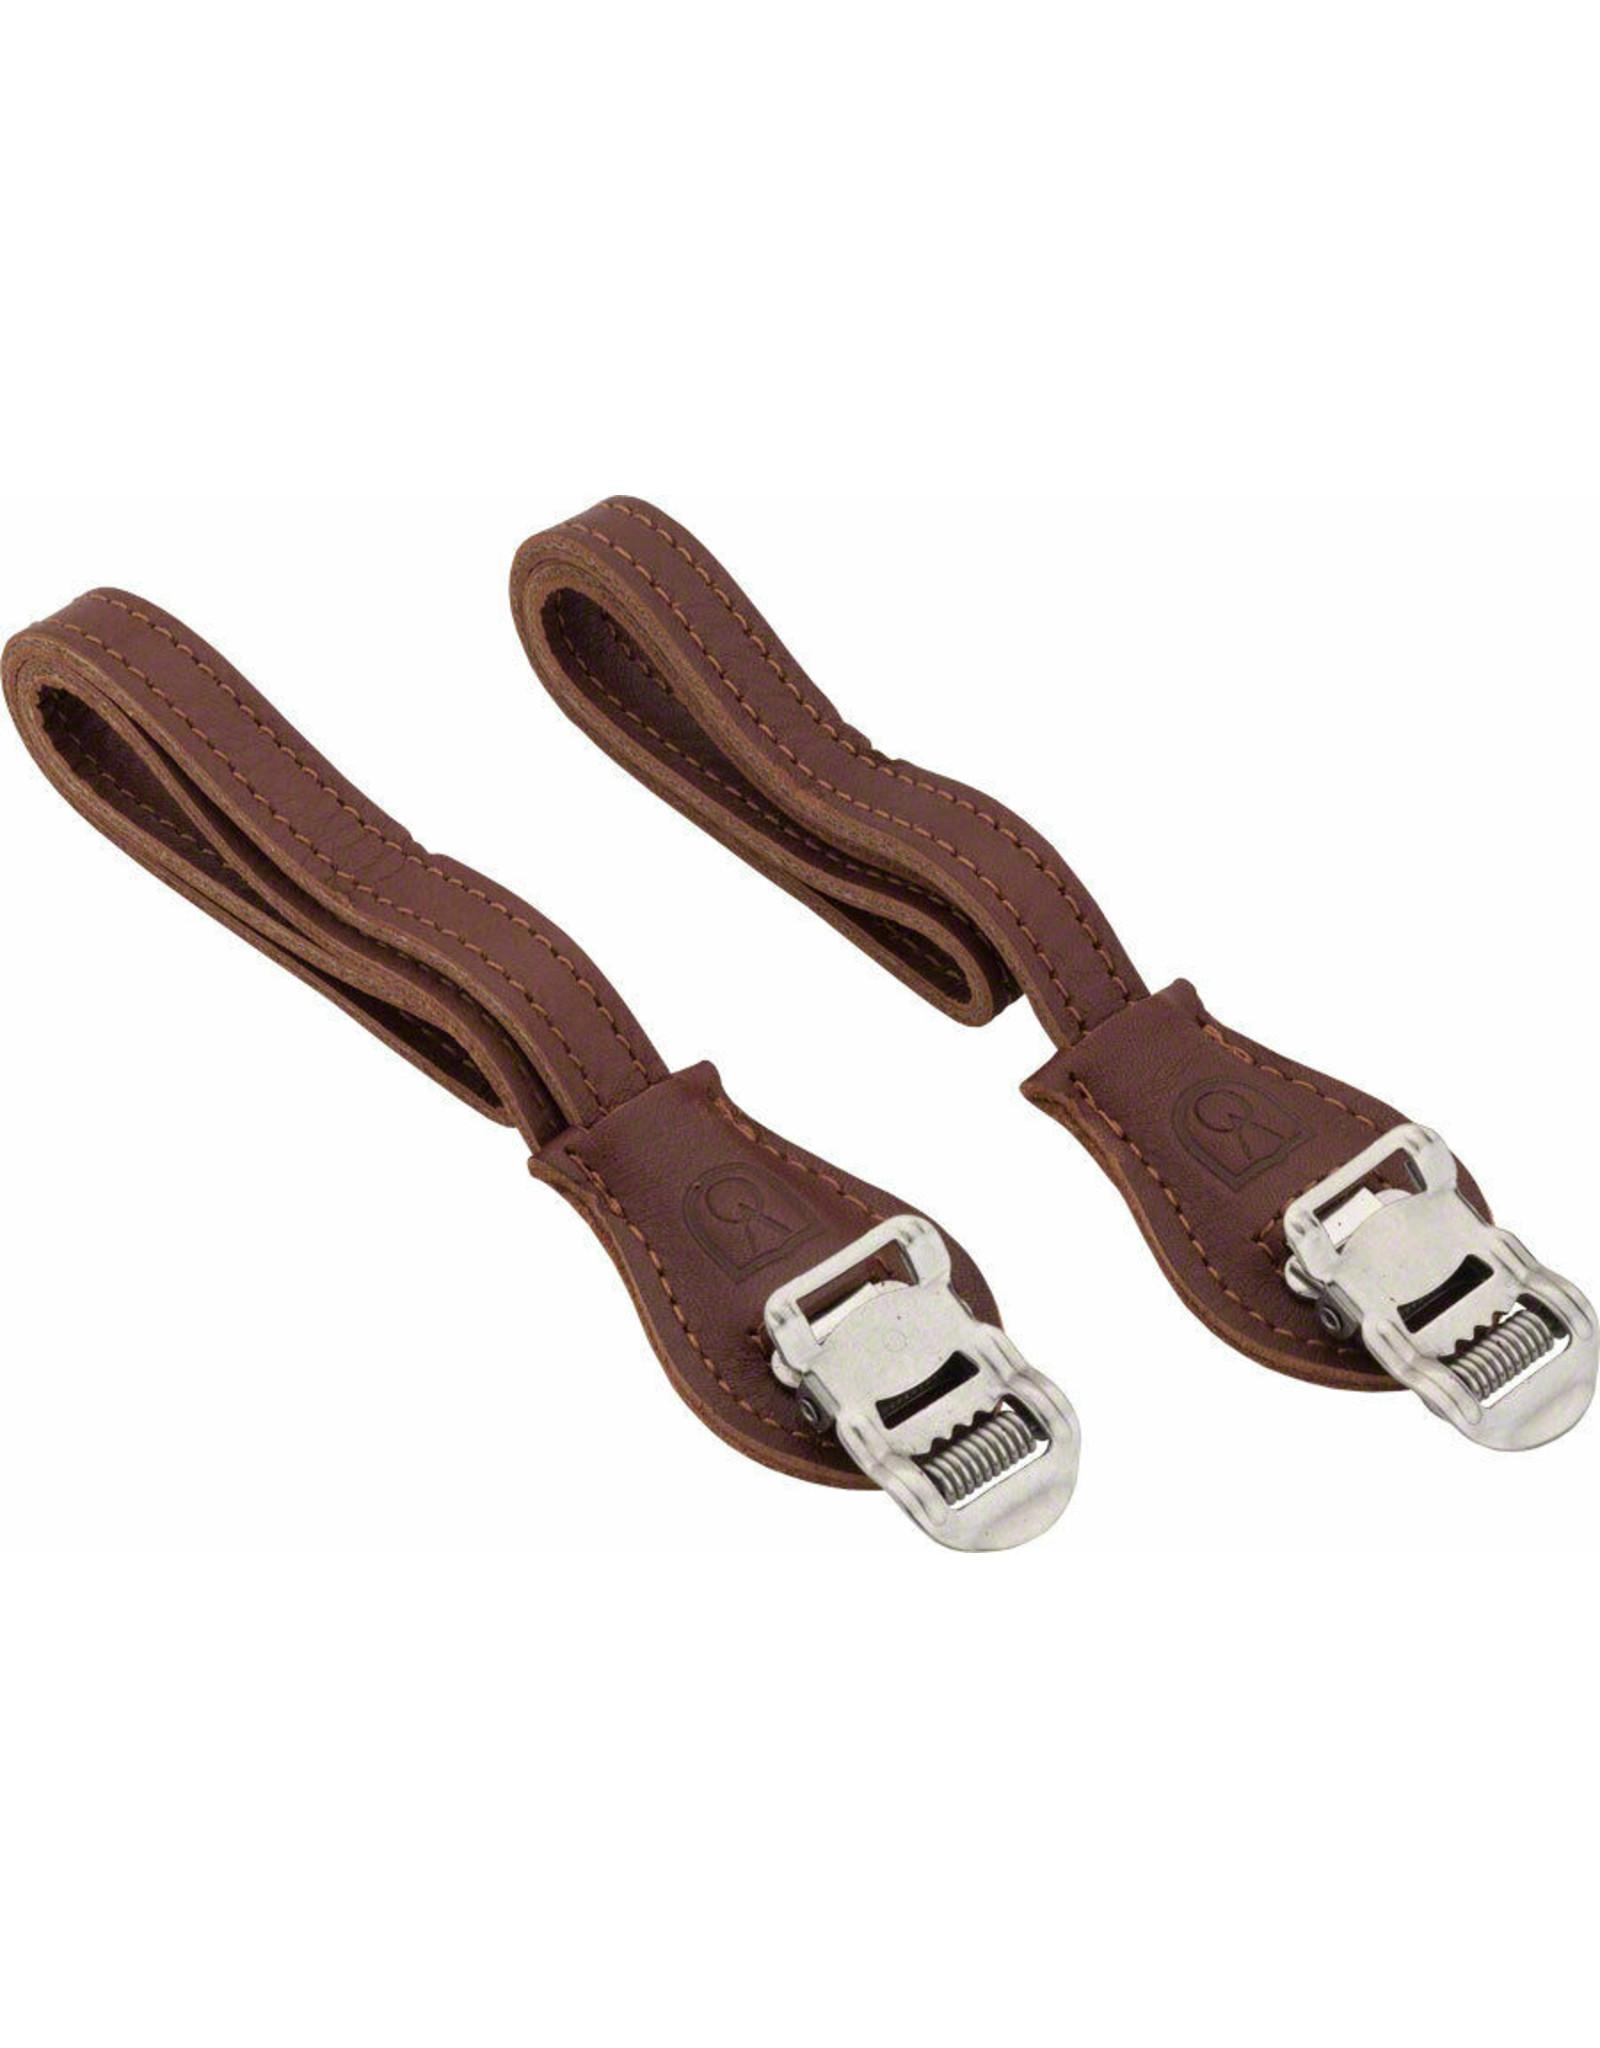 Grand Cru Leather Straps Brown